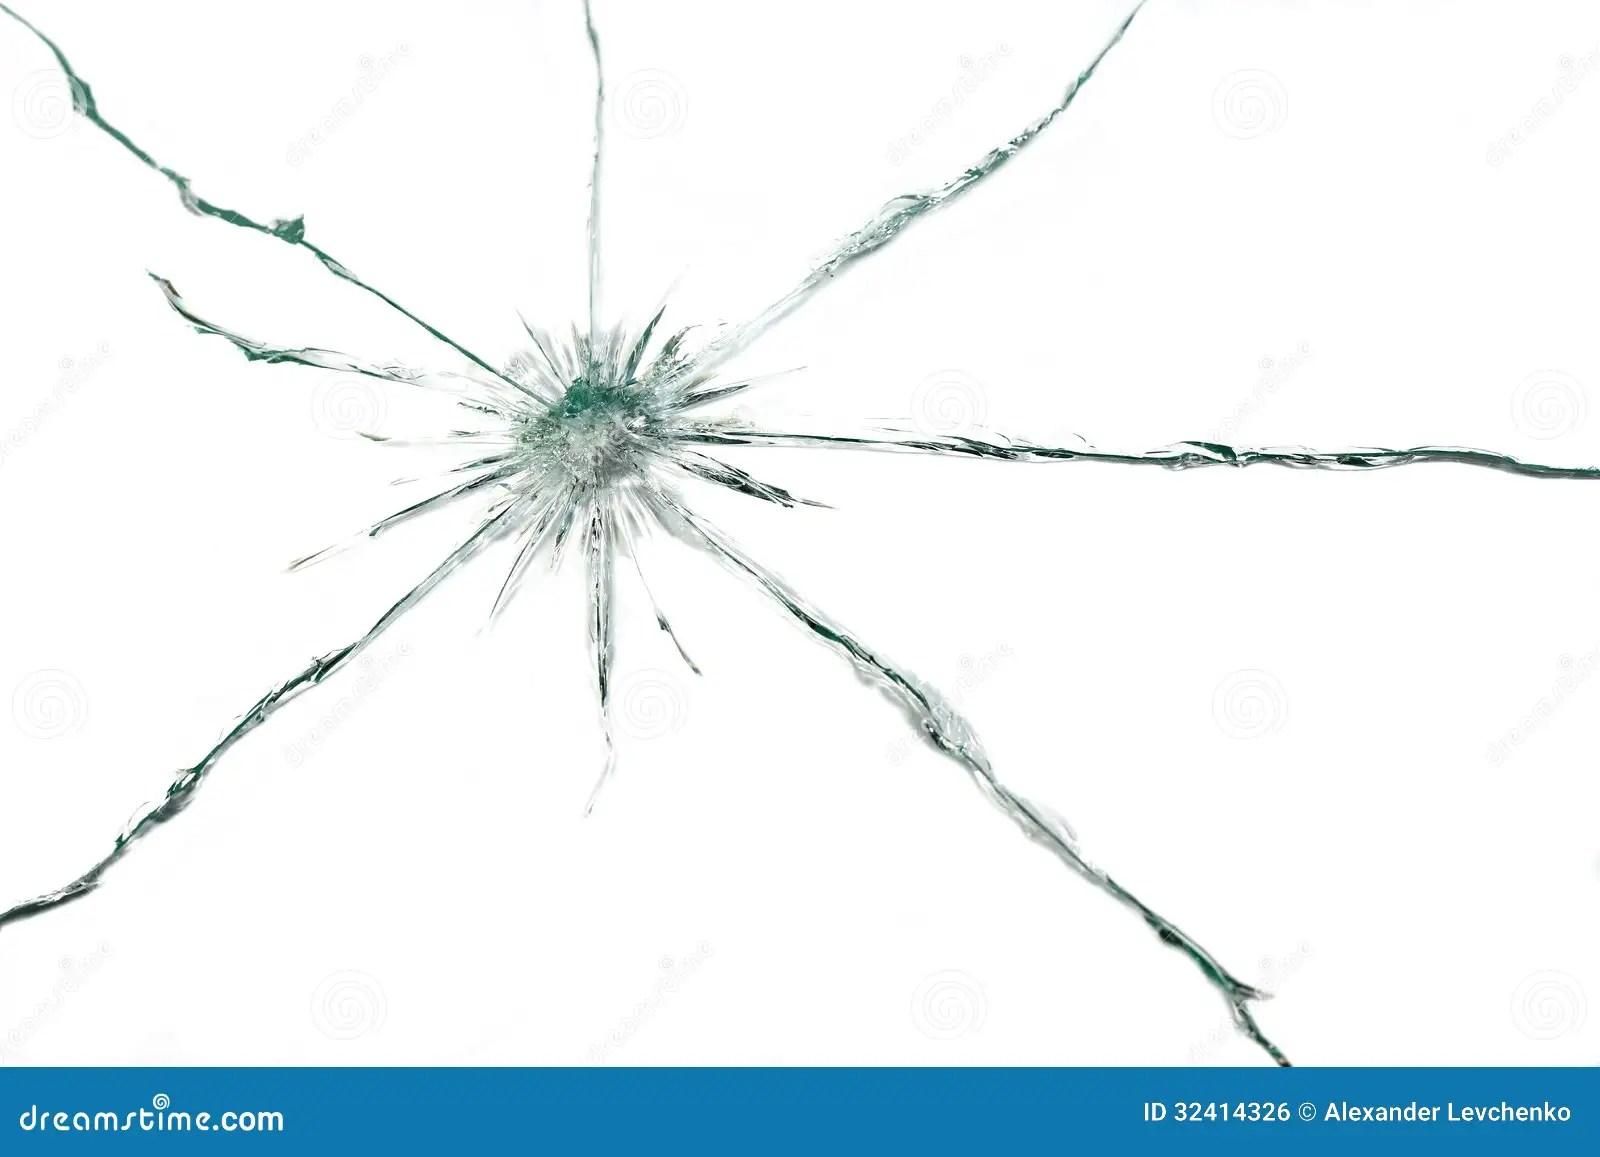 Broken Glass Royalty Free Stock Image